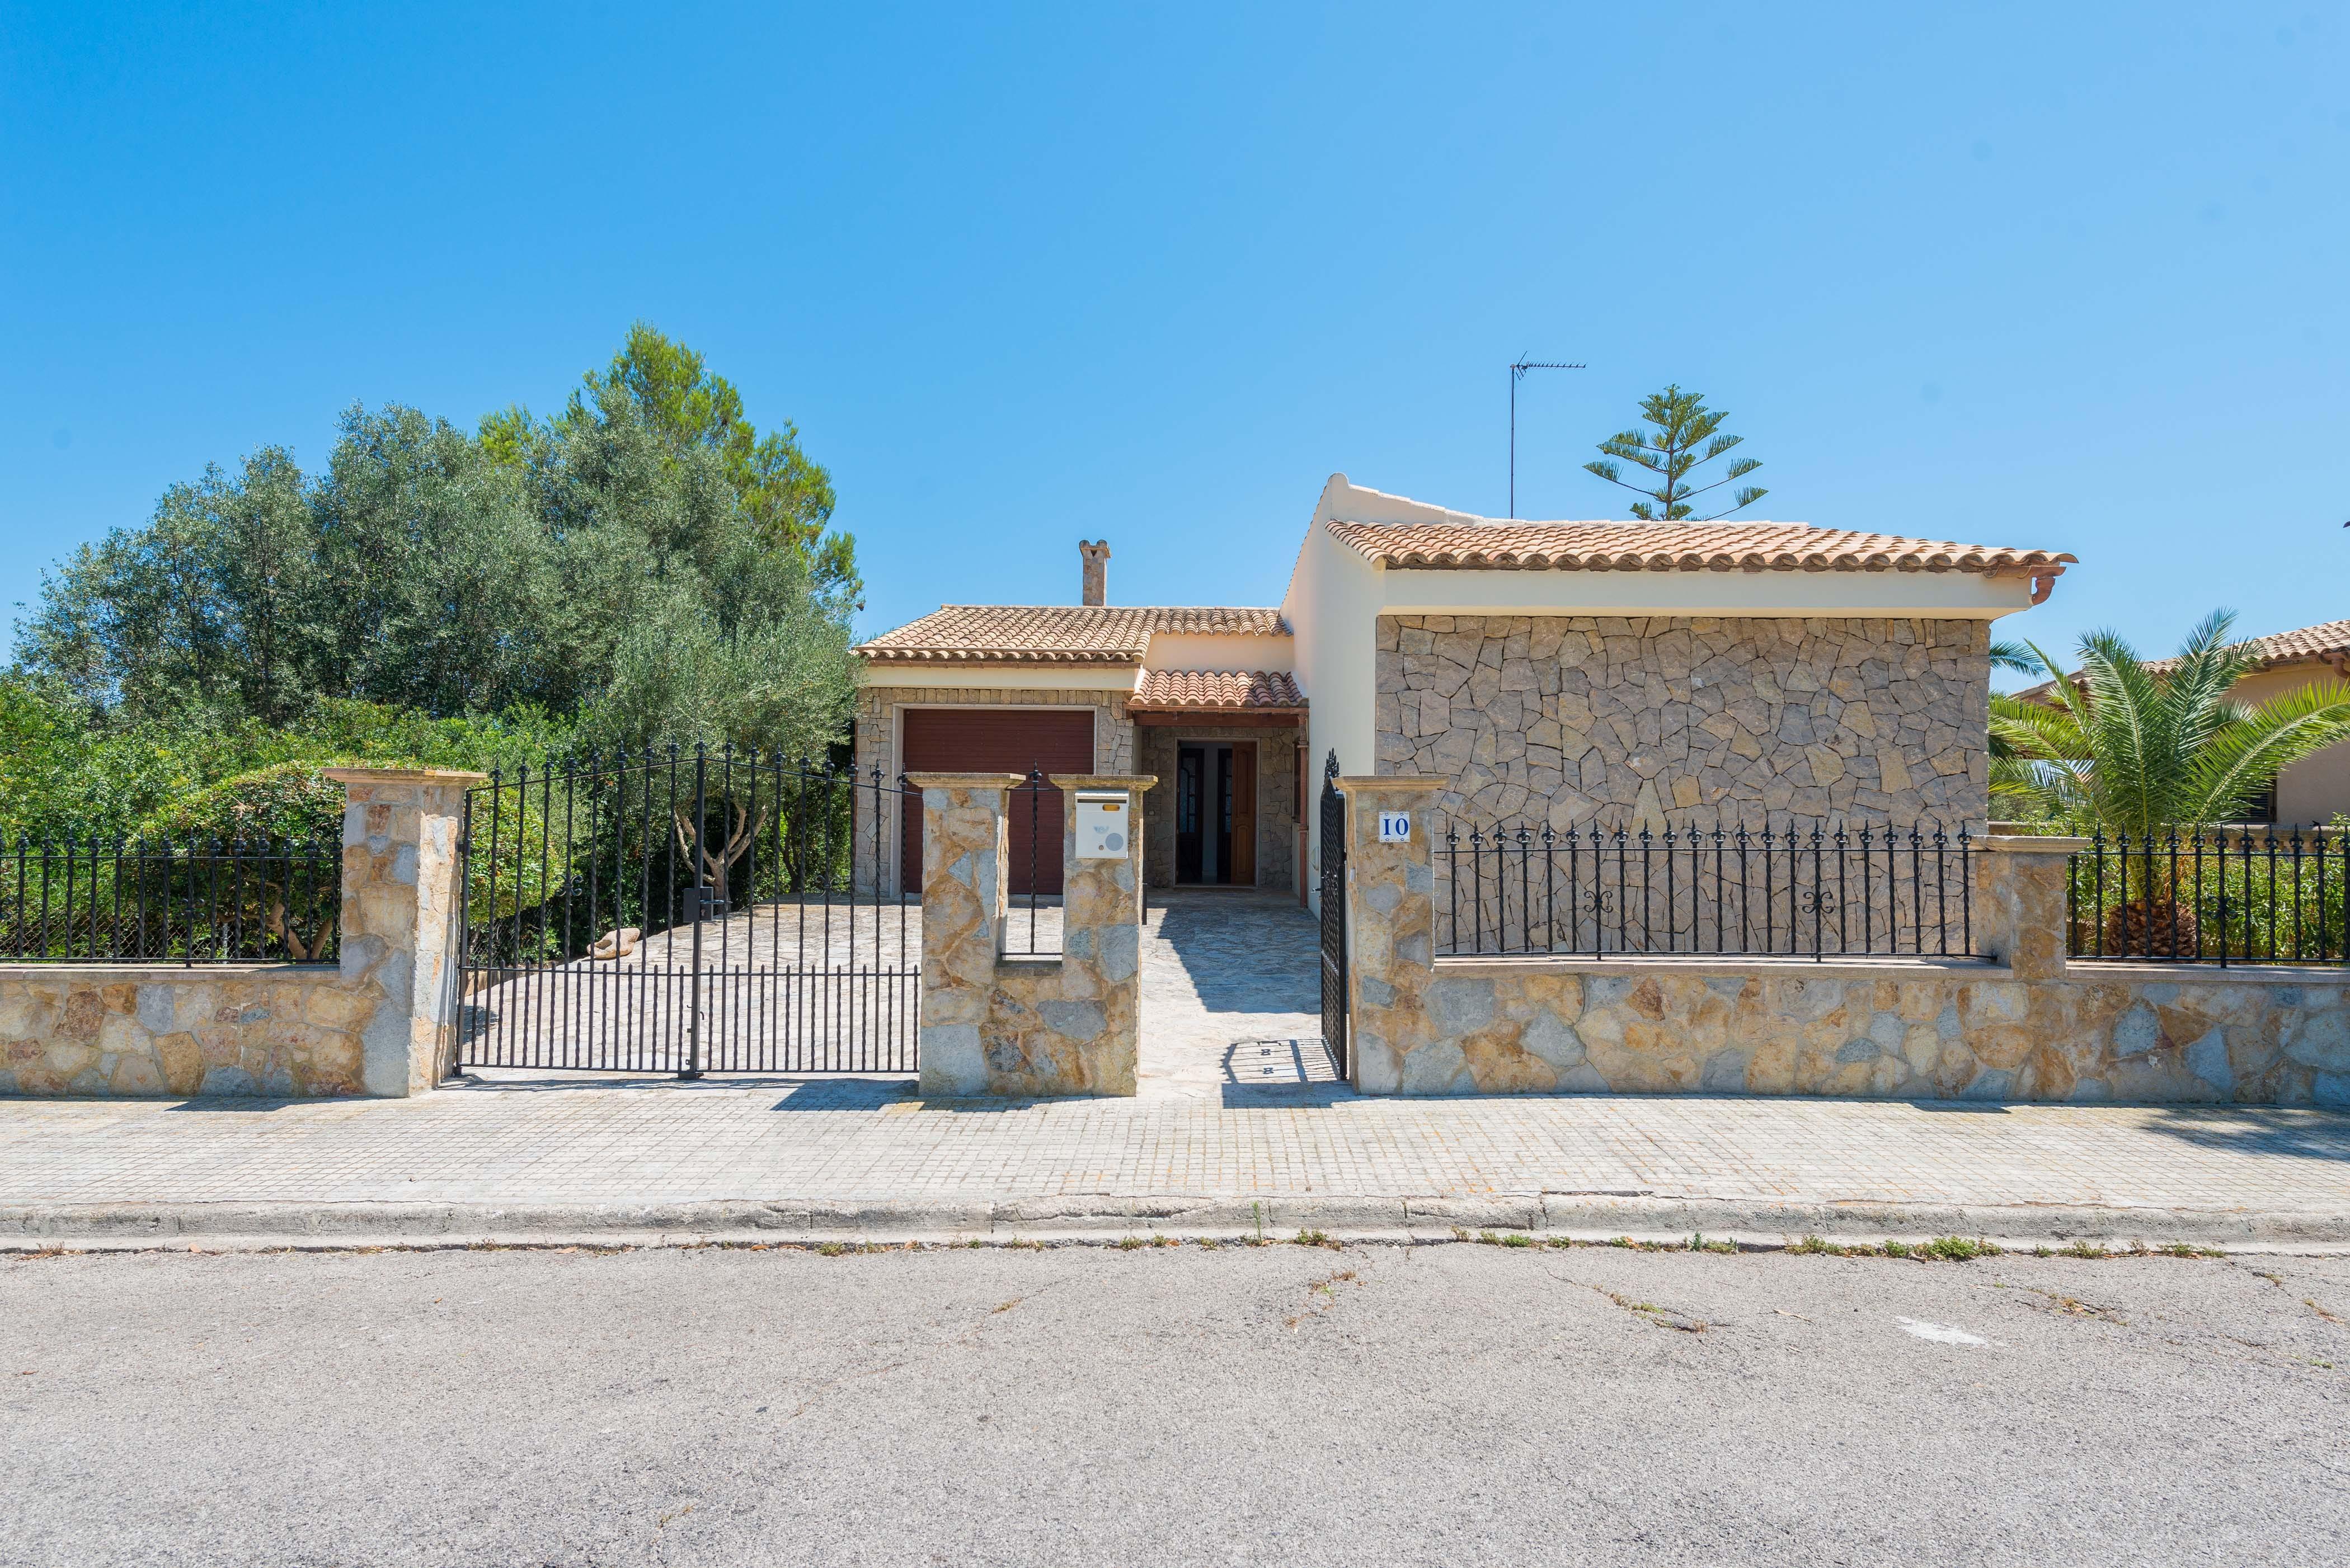 Ferienhaus PLATO (1871745), Cala Mandia, Mallorca, Balearische Inseln, Spanien, Bild 22